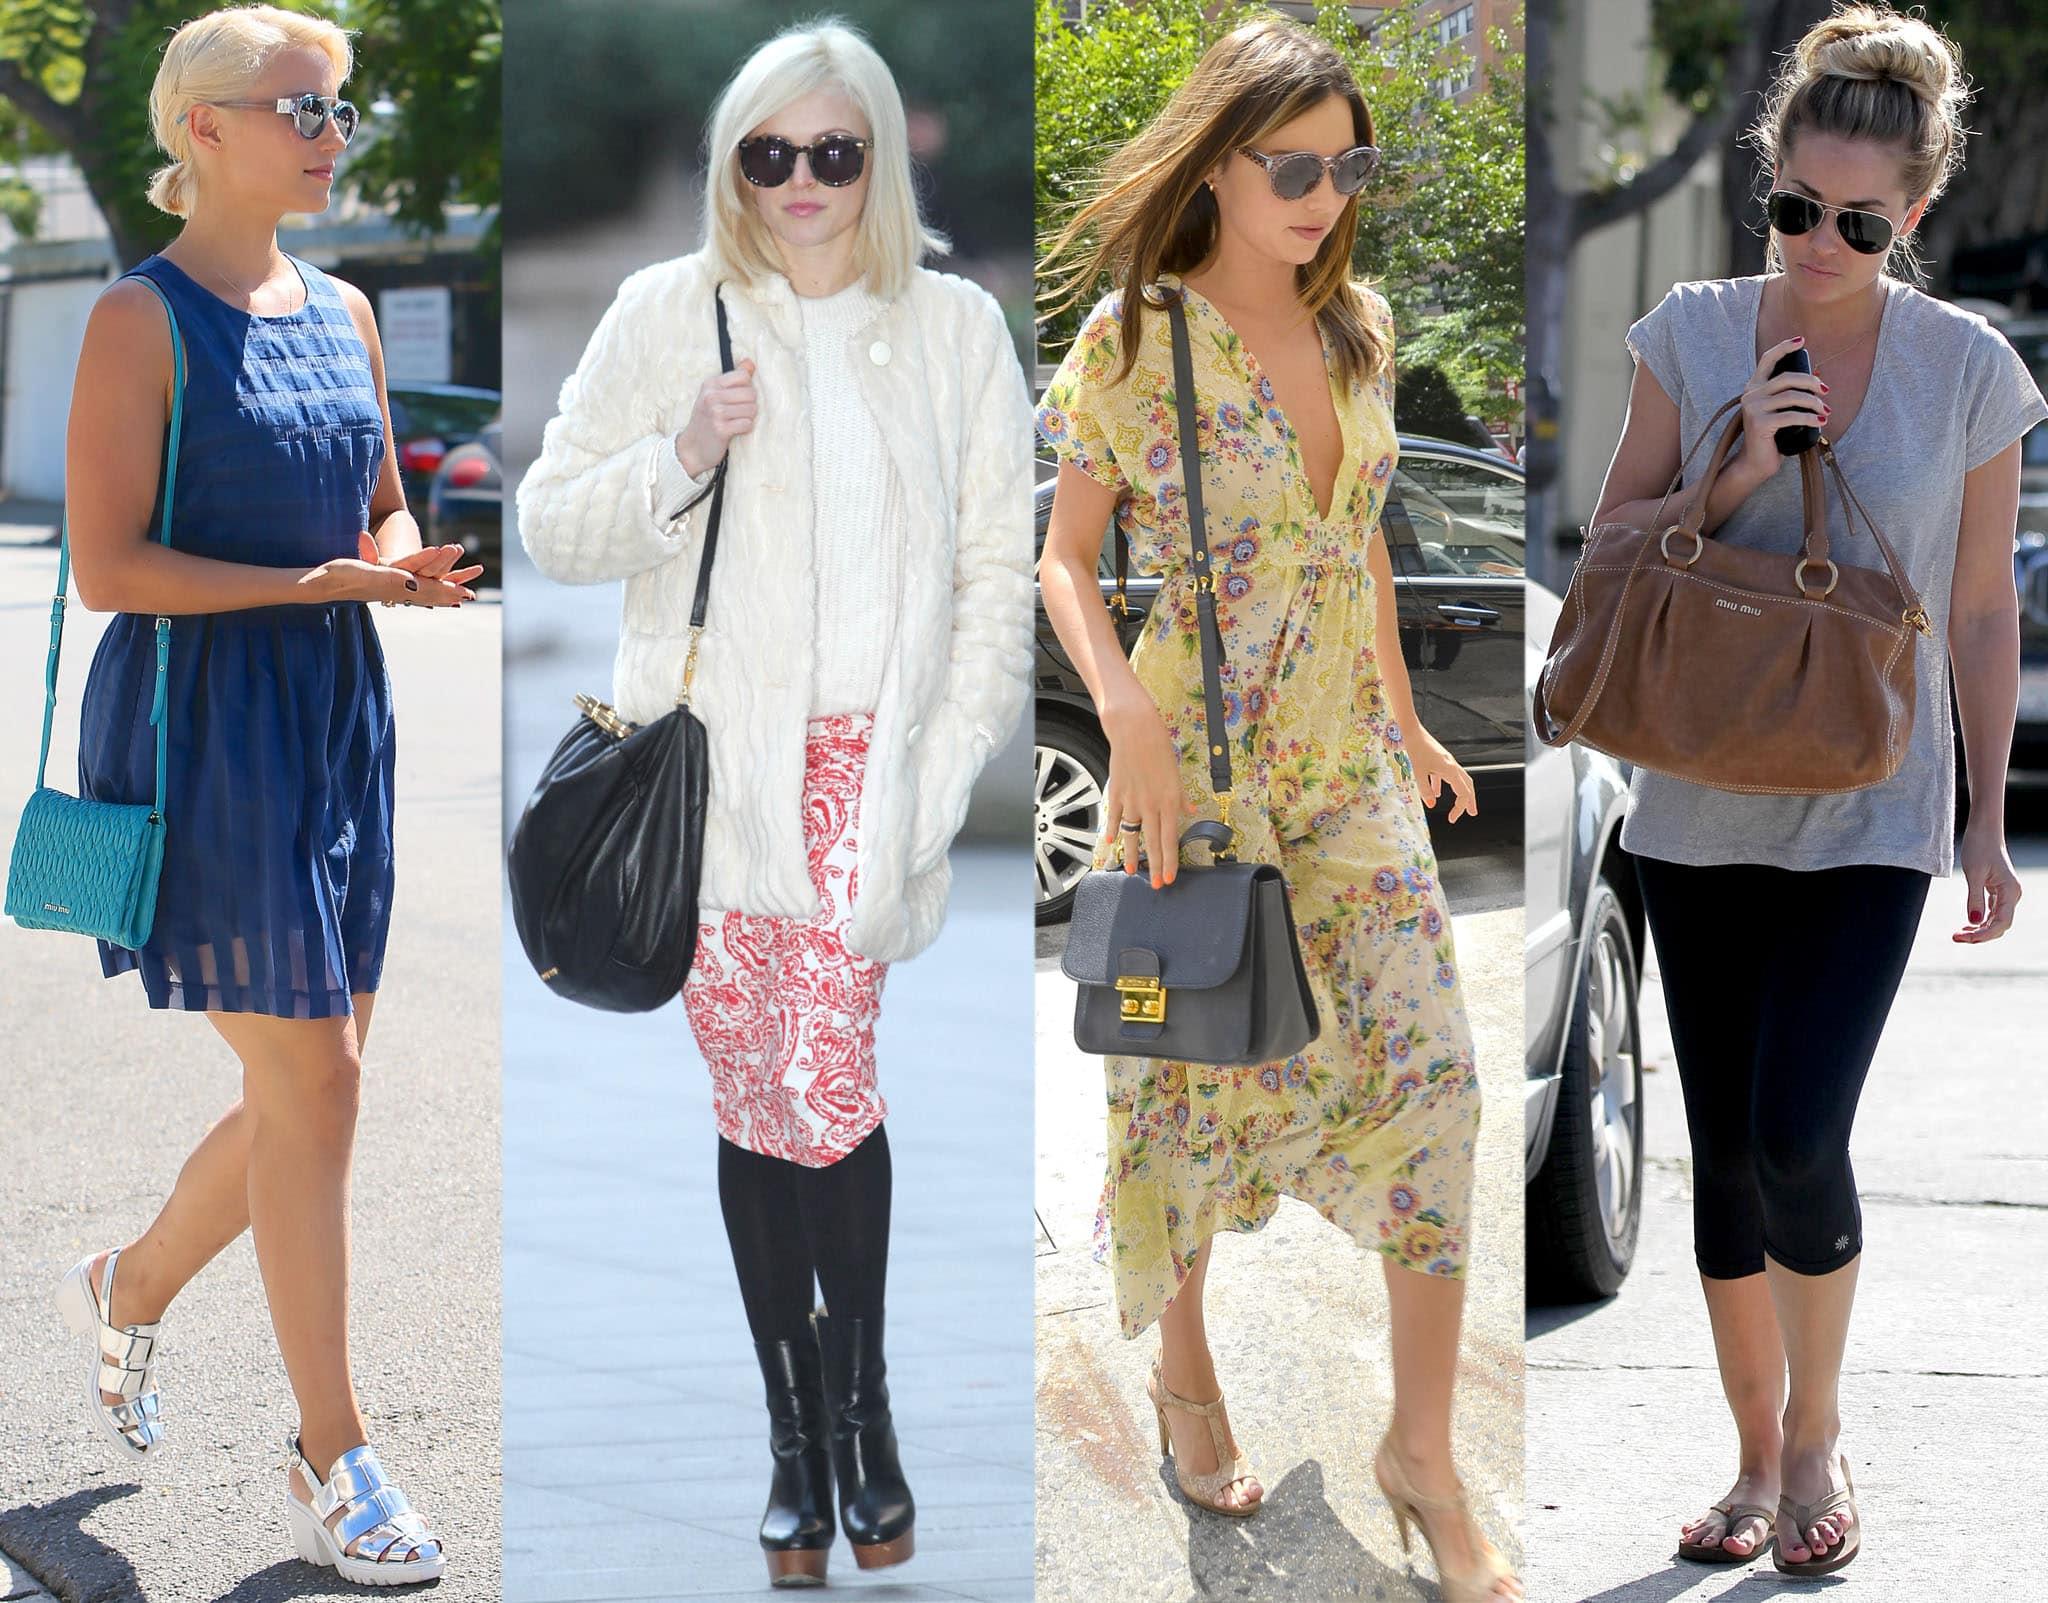 Dianna Agron, Fearne Cotton, Miranda Kerr, and Lauren Conrad carrying Miu Miu bags